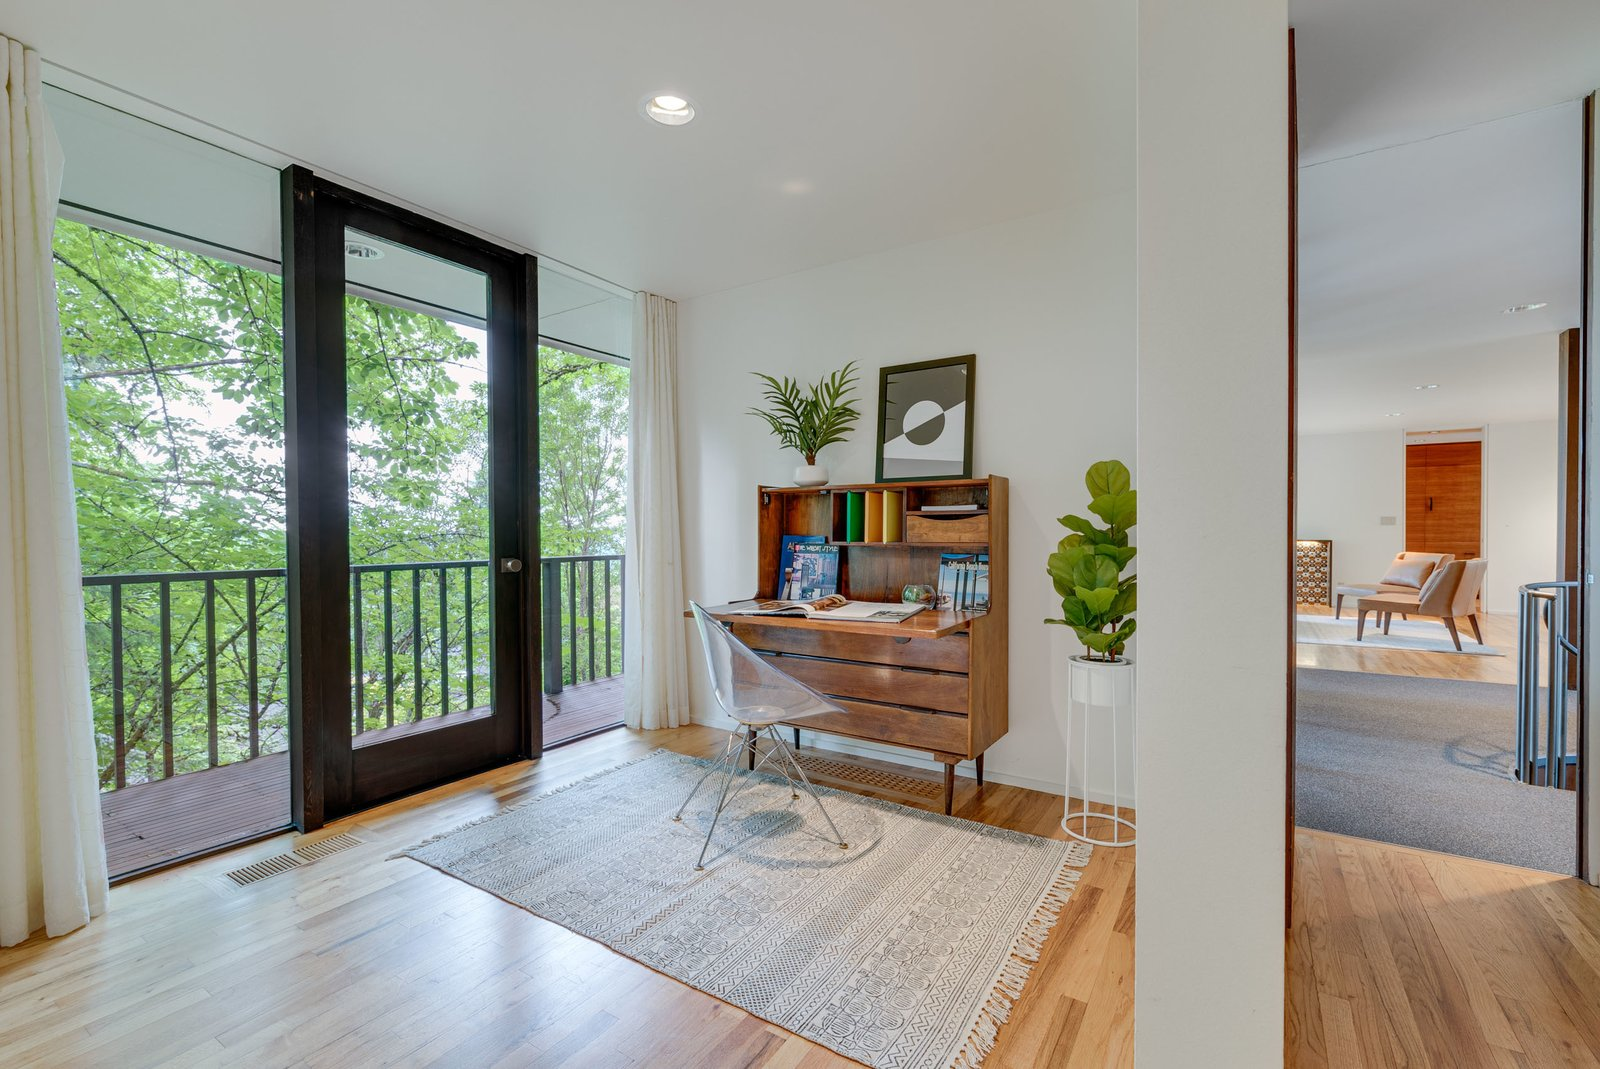 William Fletcher Portland Midcentury Home office